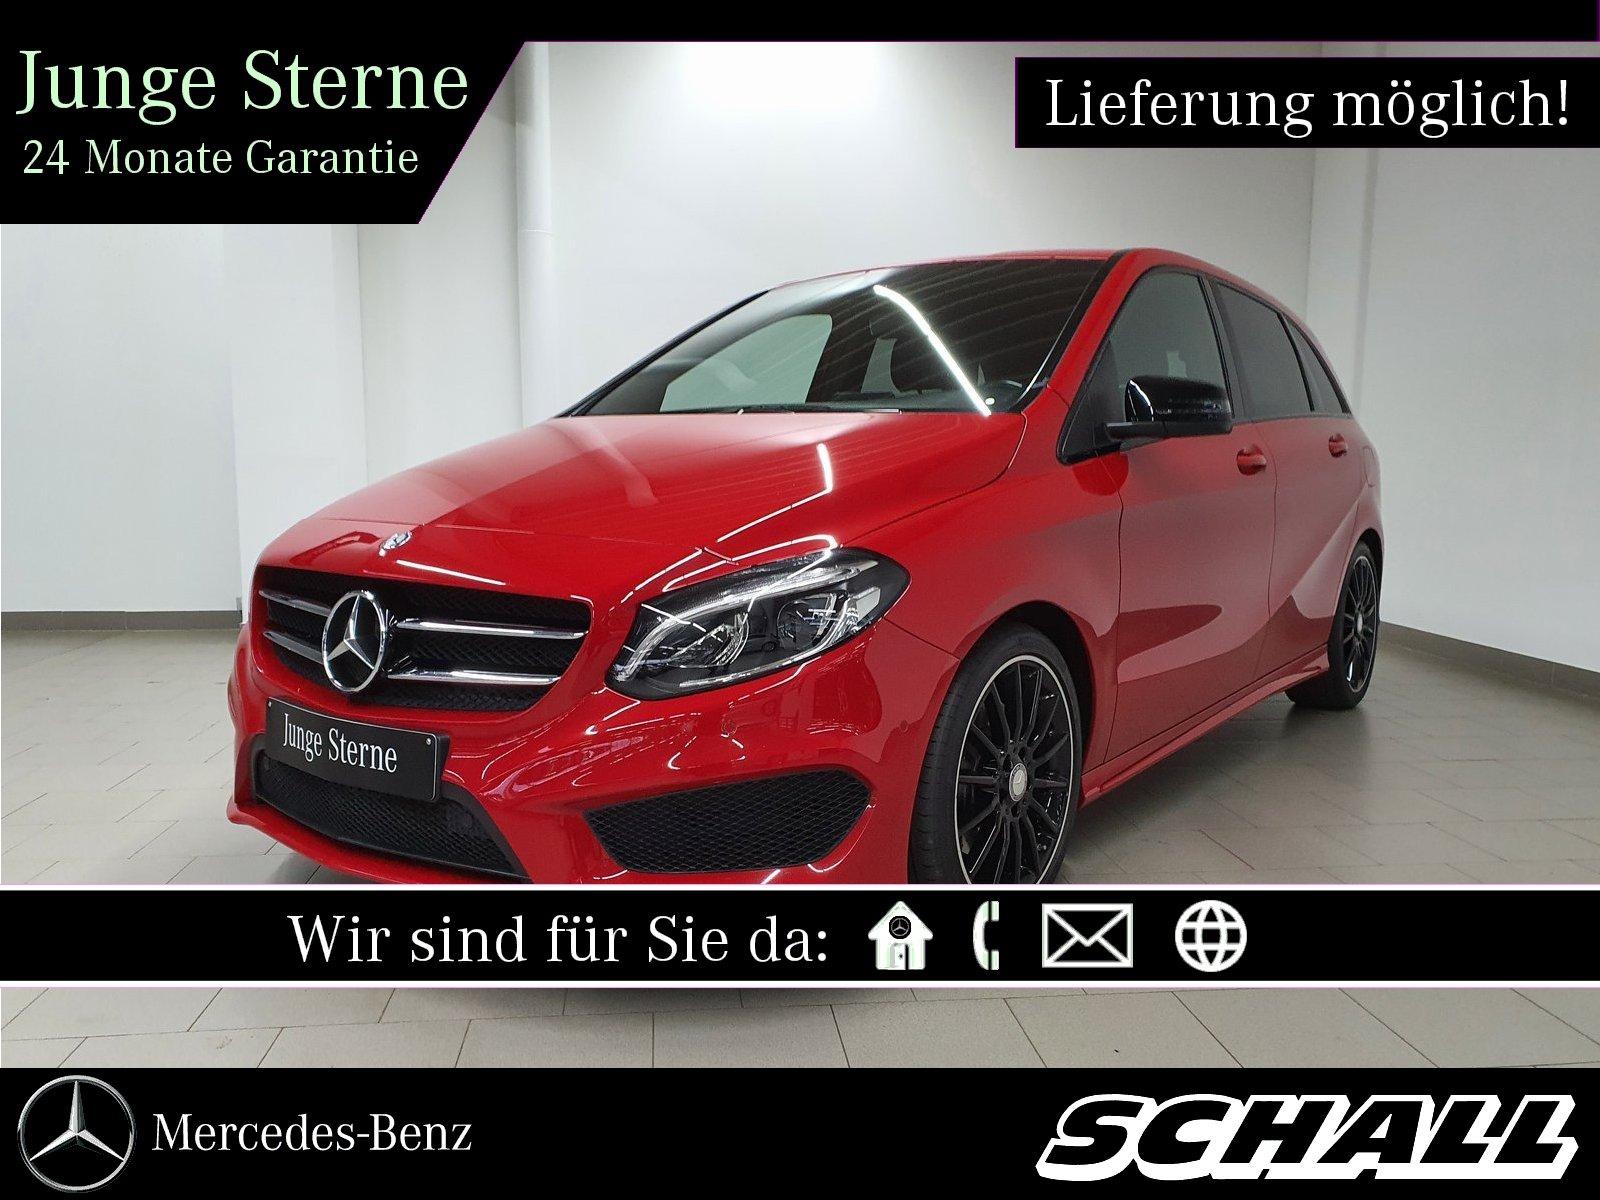 Mercedes-Benz B 220 CDI AMG+NIGHT+AHK+LED+COMAND+KAMERA+TOTWI, Jahr 2014, Diesel